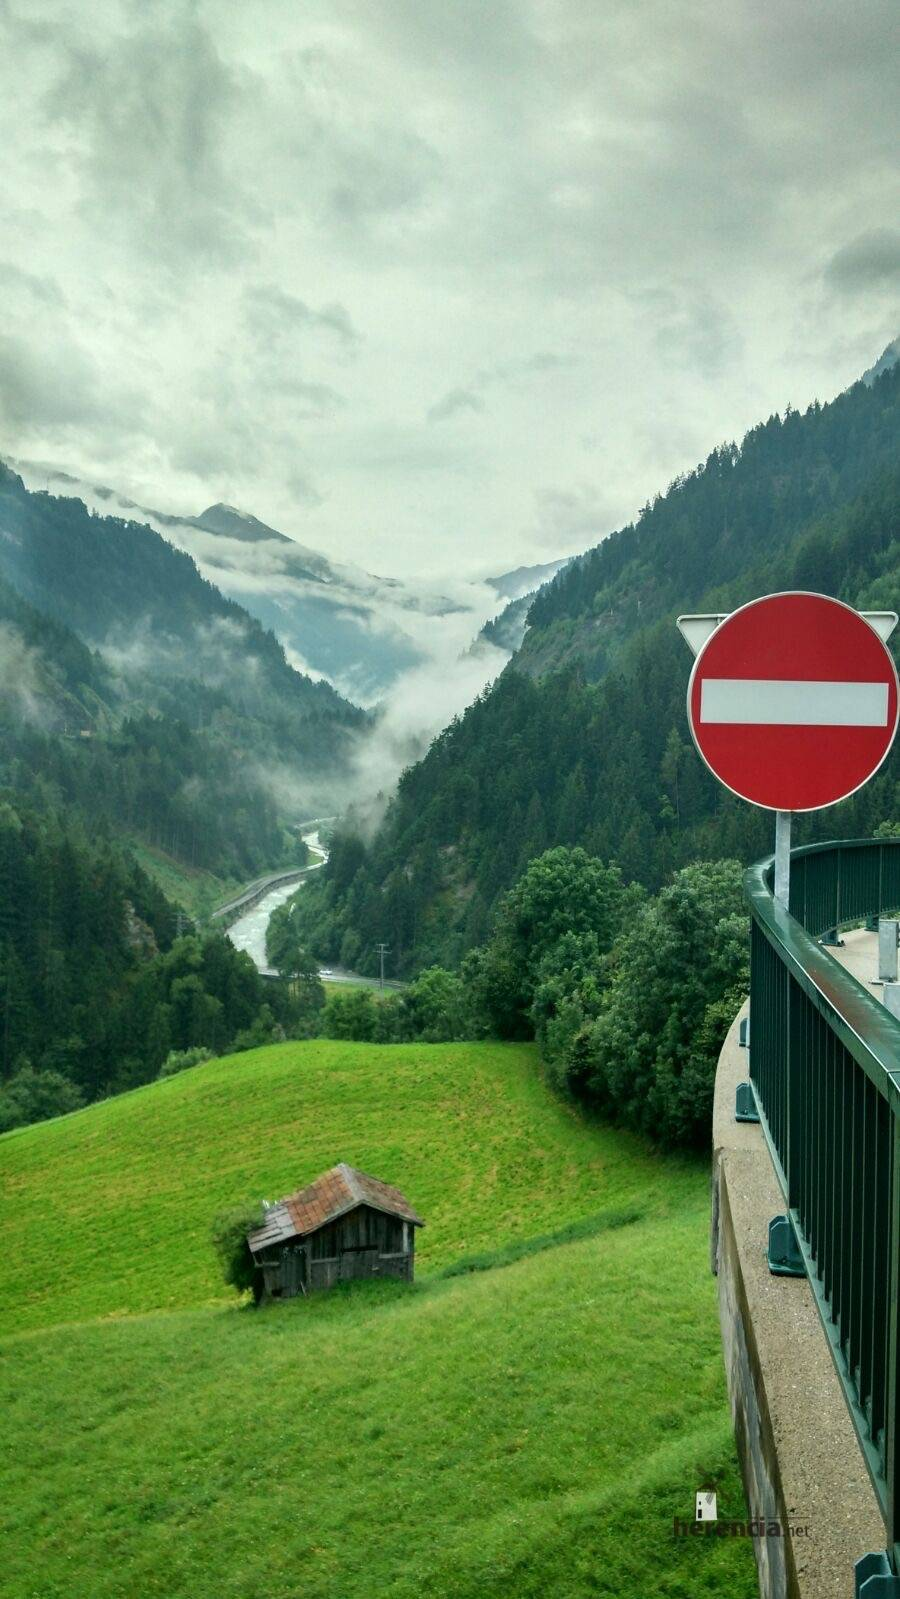 Etapa 34 Perle en los Alpes tiroleses06 - Etapa 34. Perlé en los Alpes tiroleses